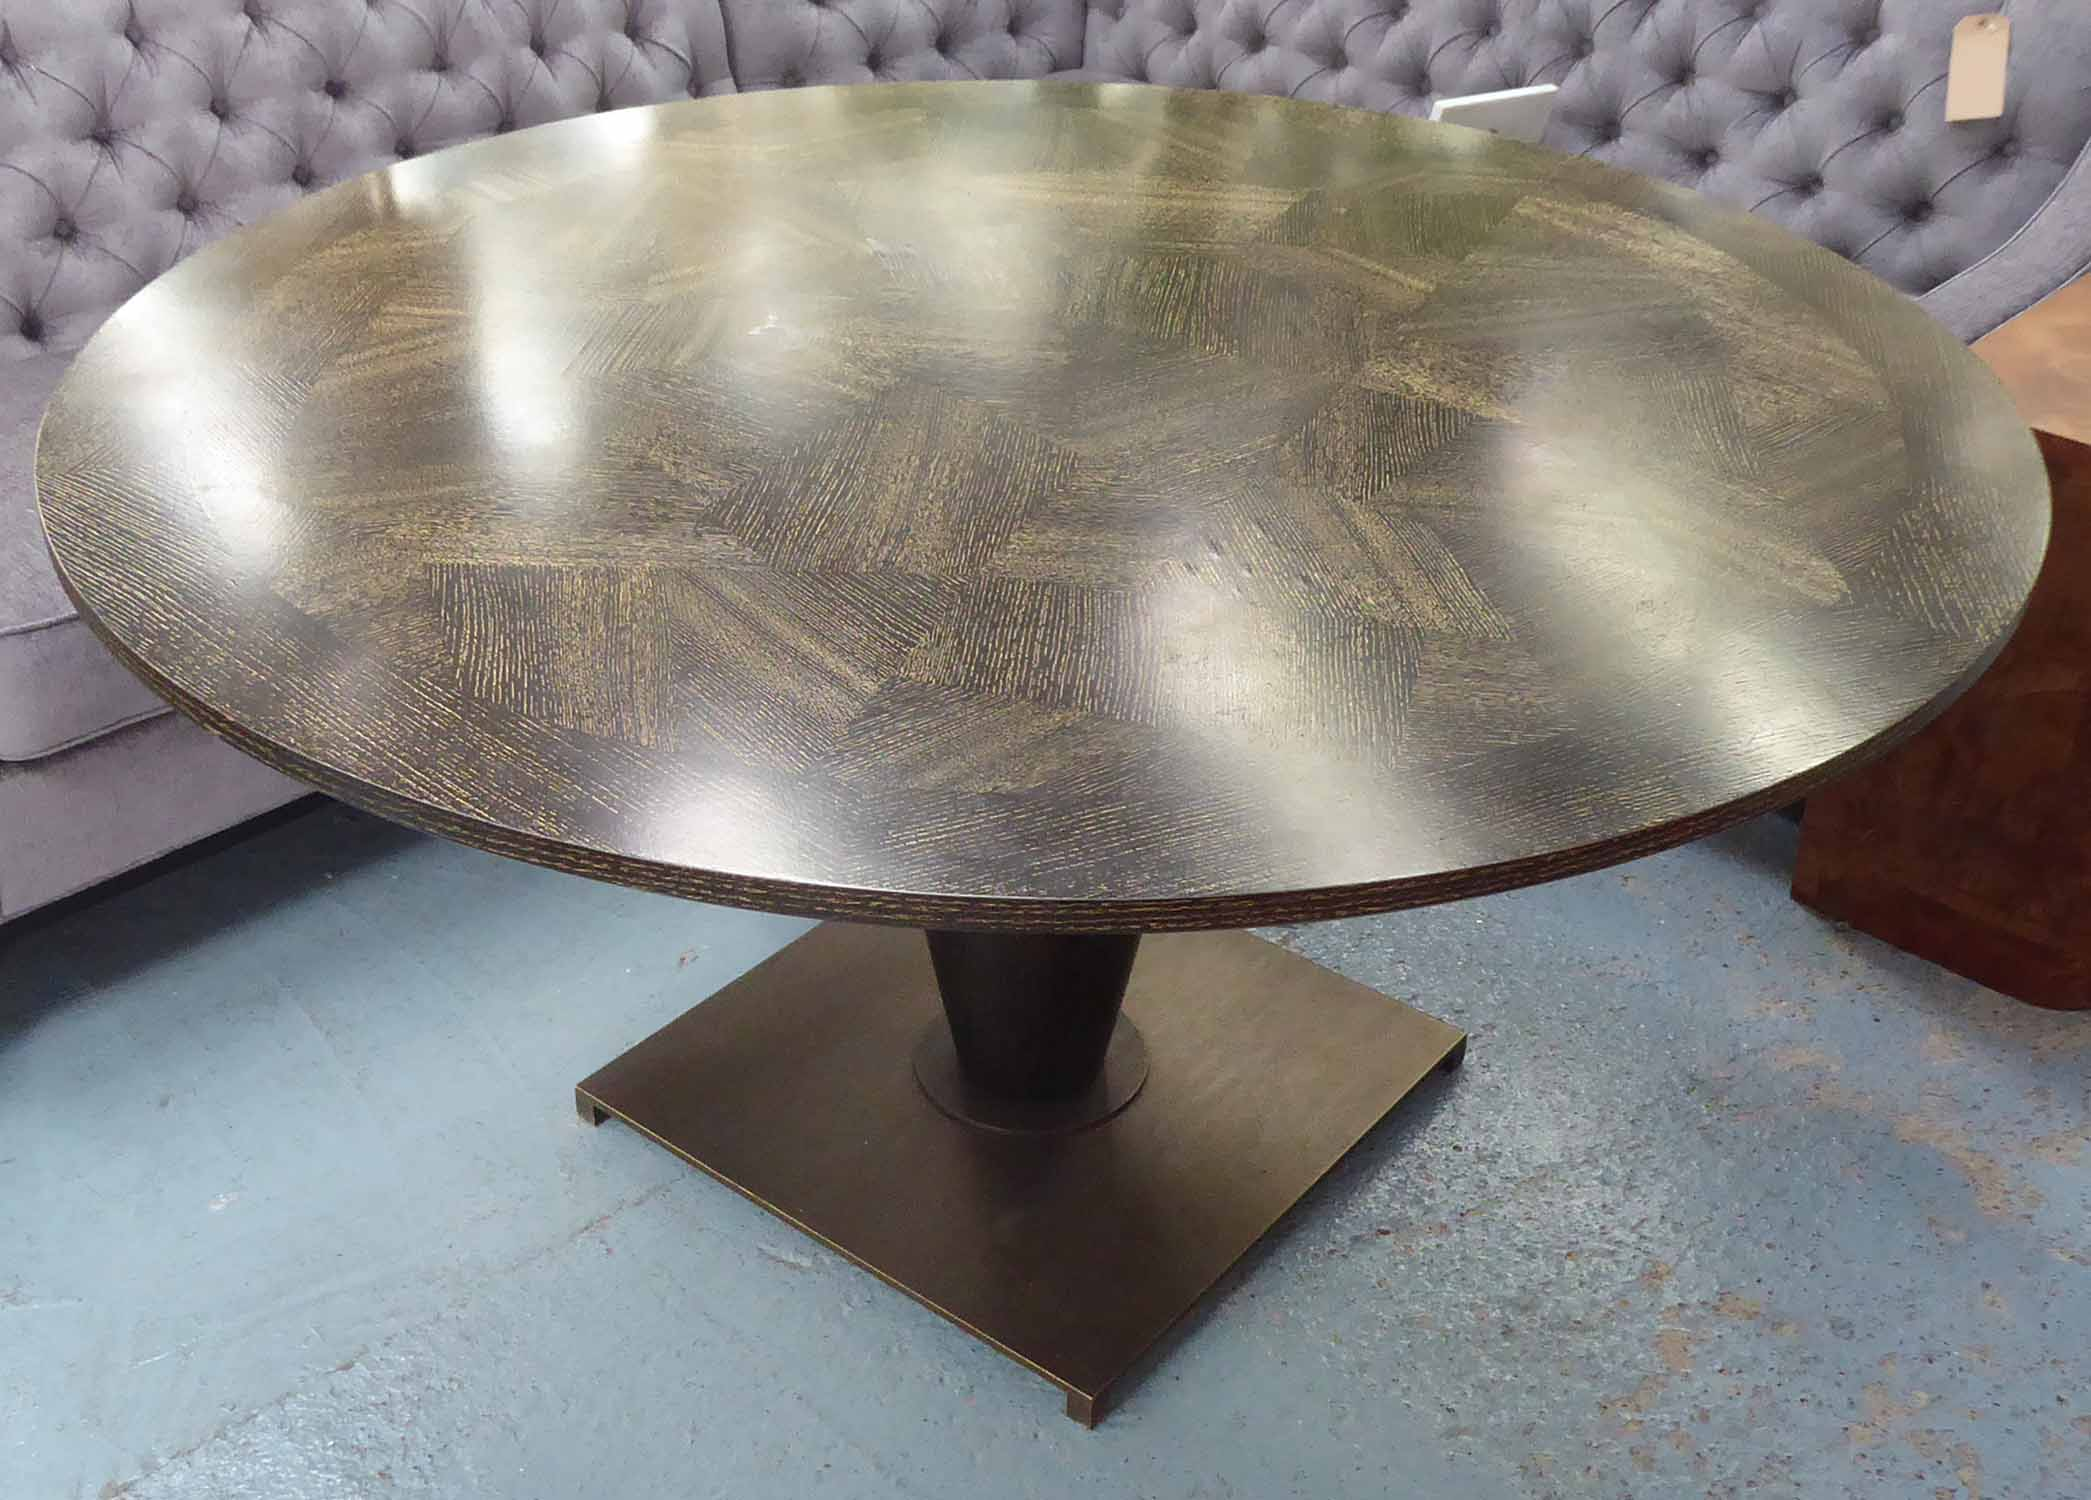 Lot 52 - ATTRIBUTED TO ROMEO SOZZI BASSANO TABLE, 150cm diam.